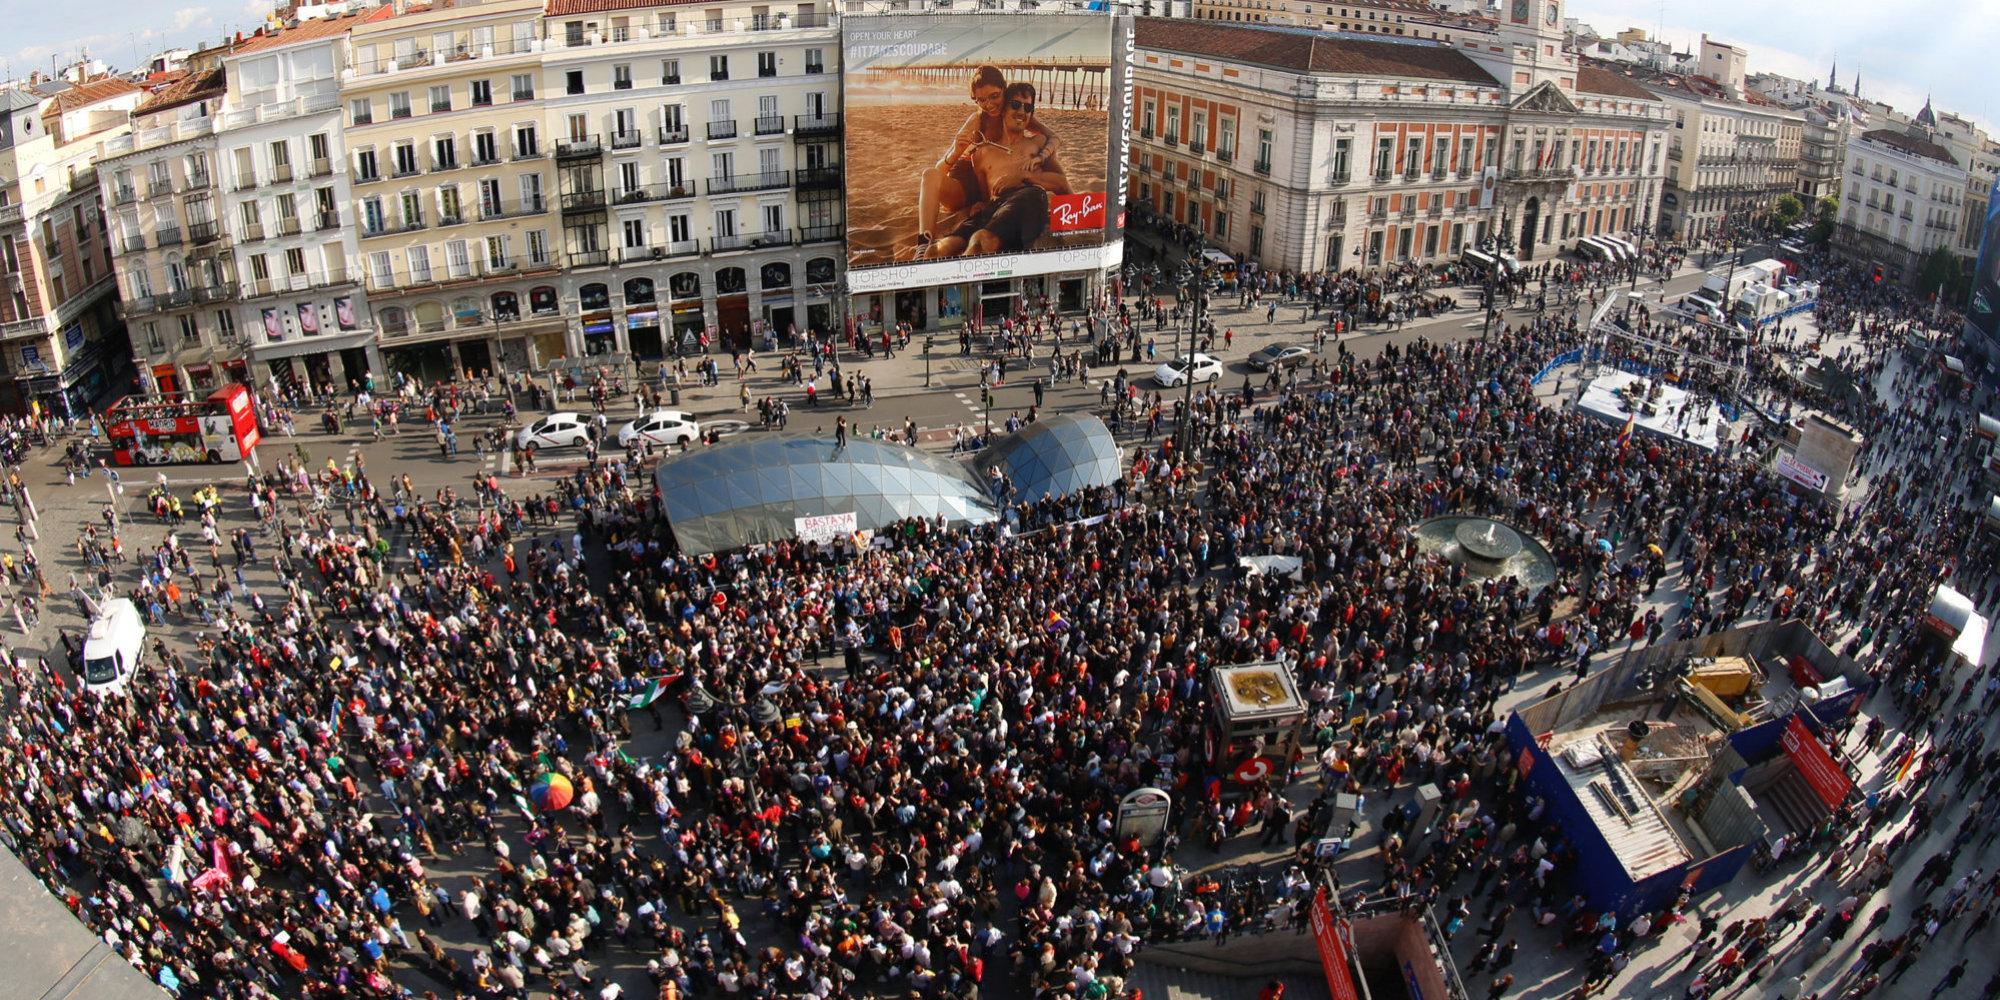 Miles de indignados vuelven a llenar la puerta del sol en for Puerta 15 foro sol